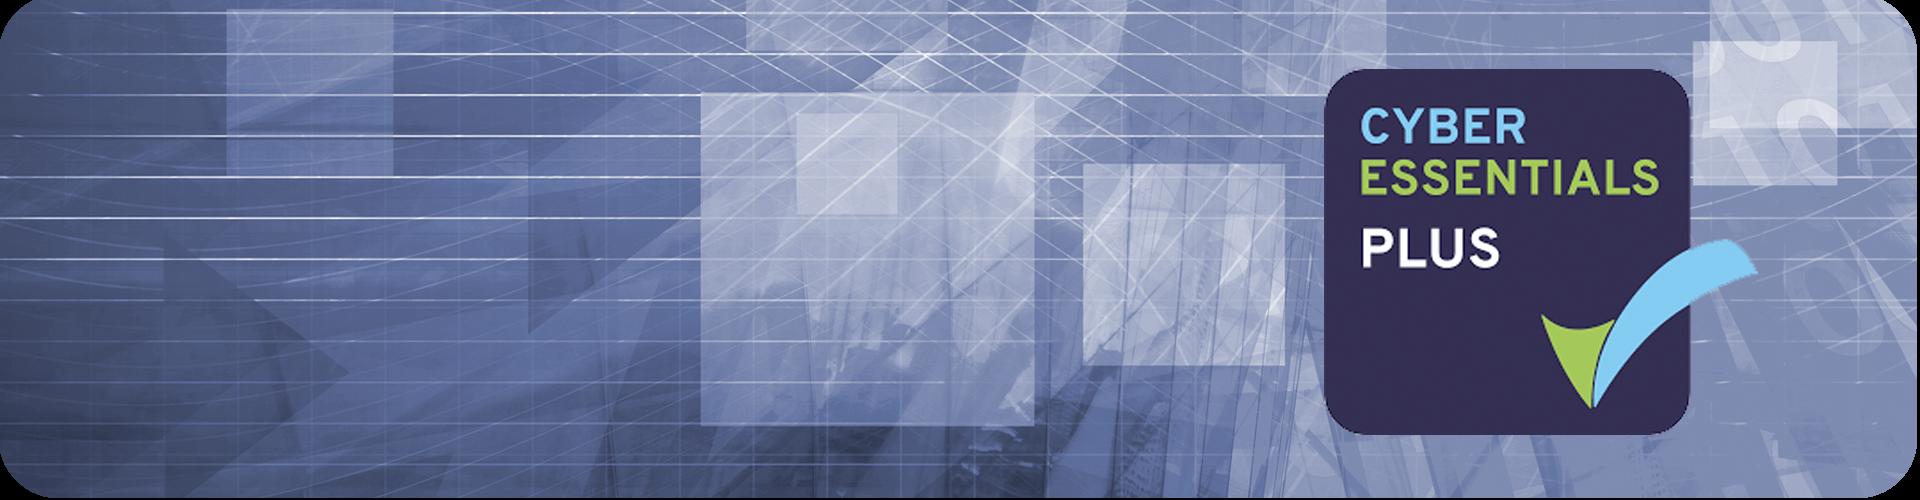 cyber essentials plus logo on a geometric background